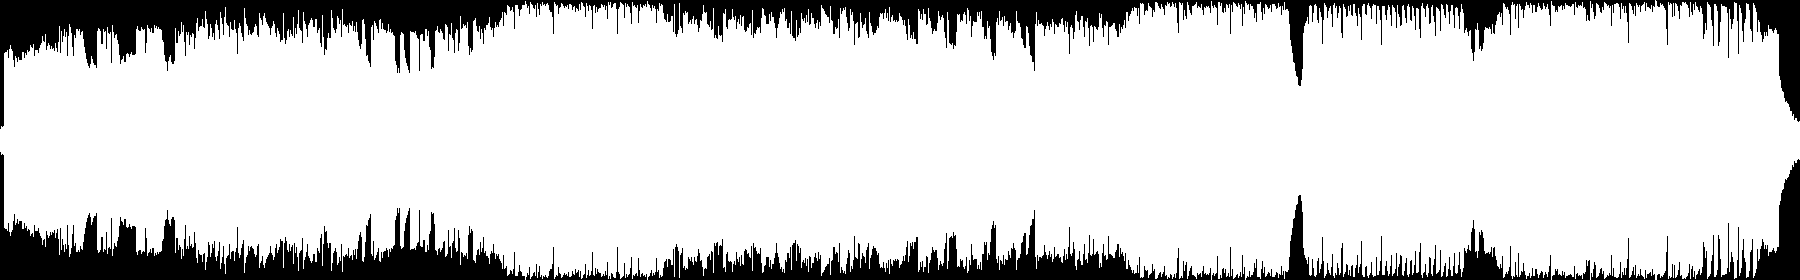 Jon Sine: Analog House #1 audio waveform